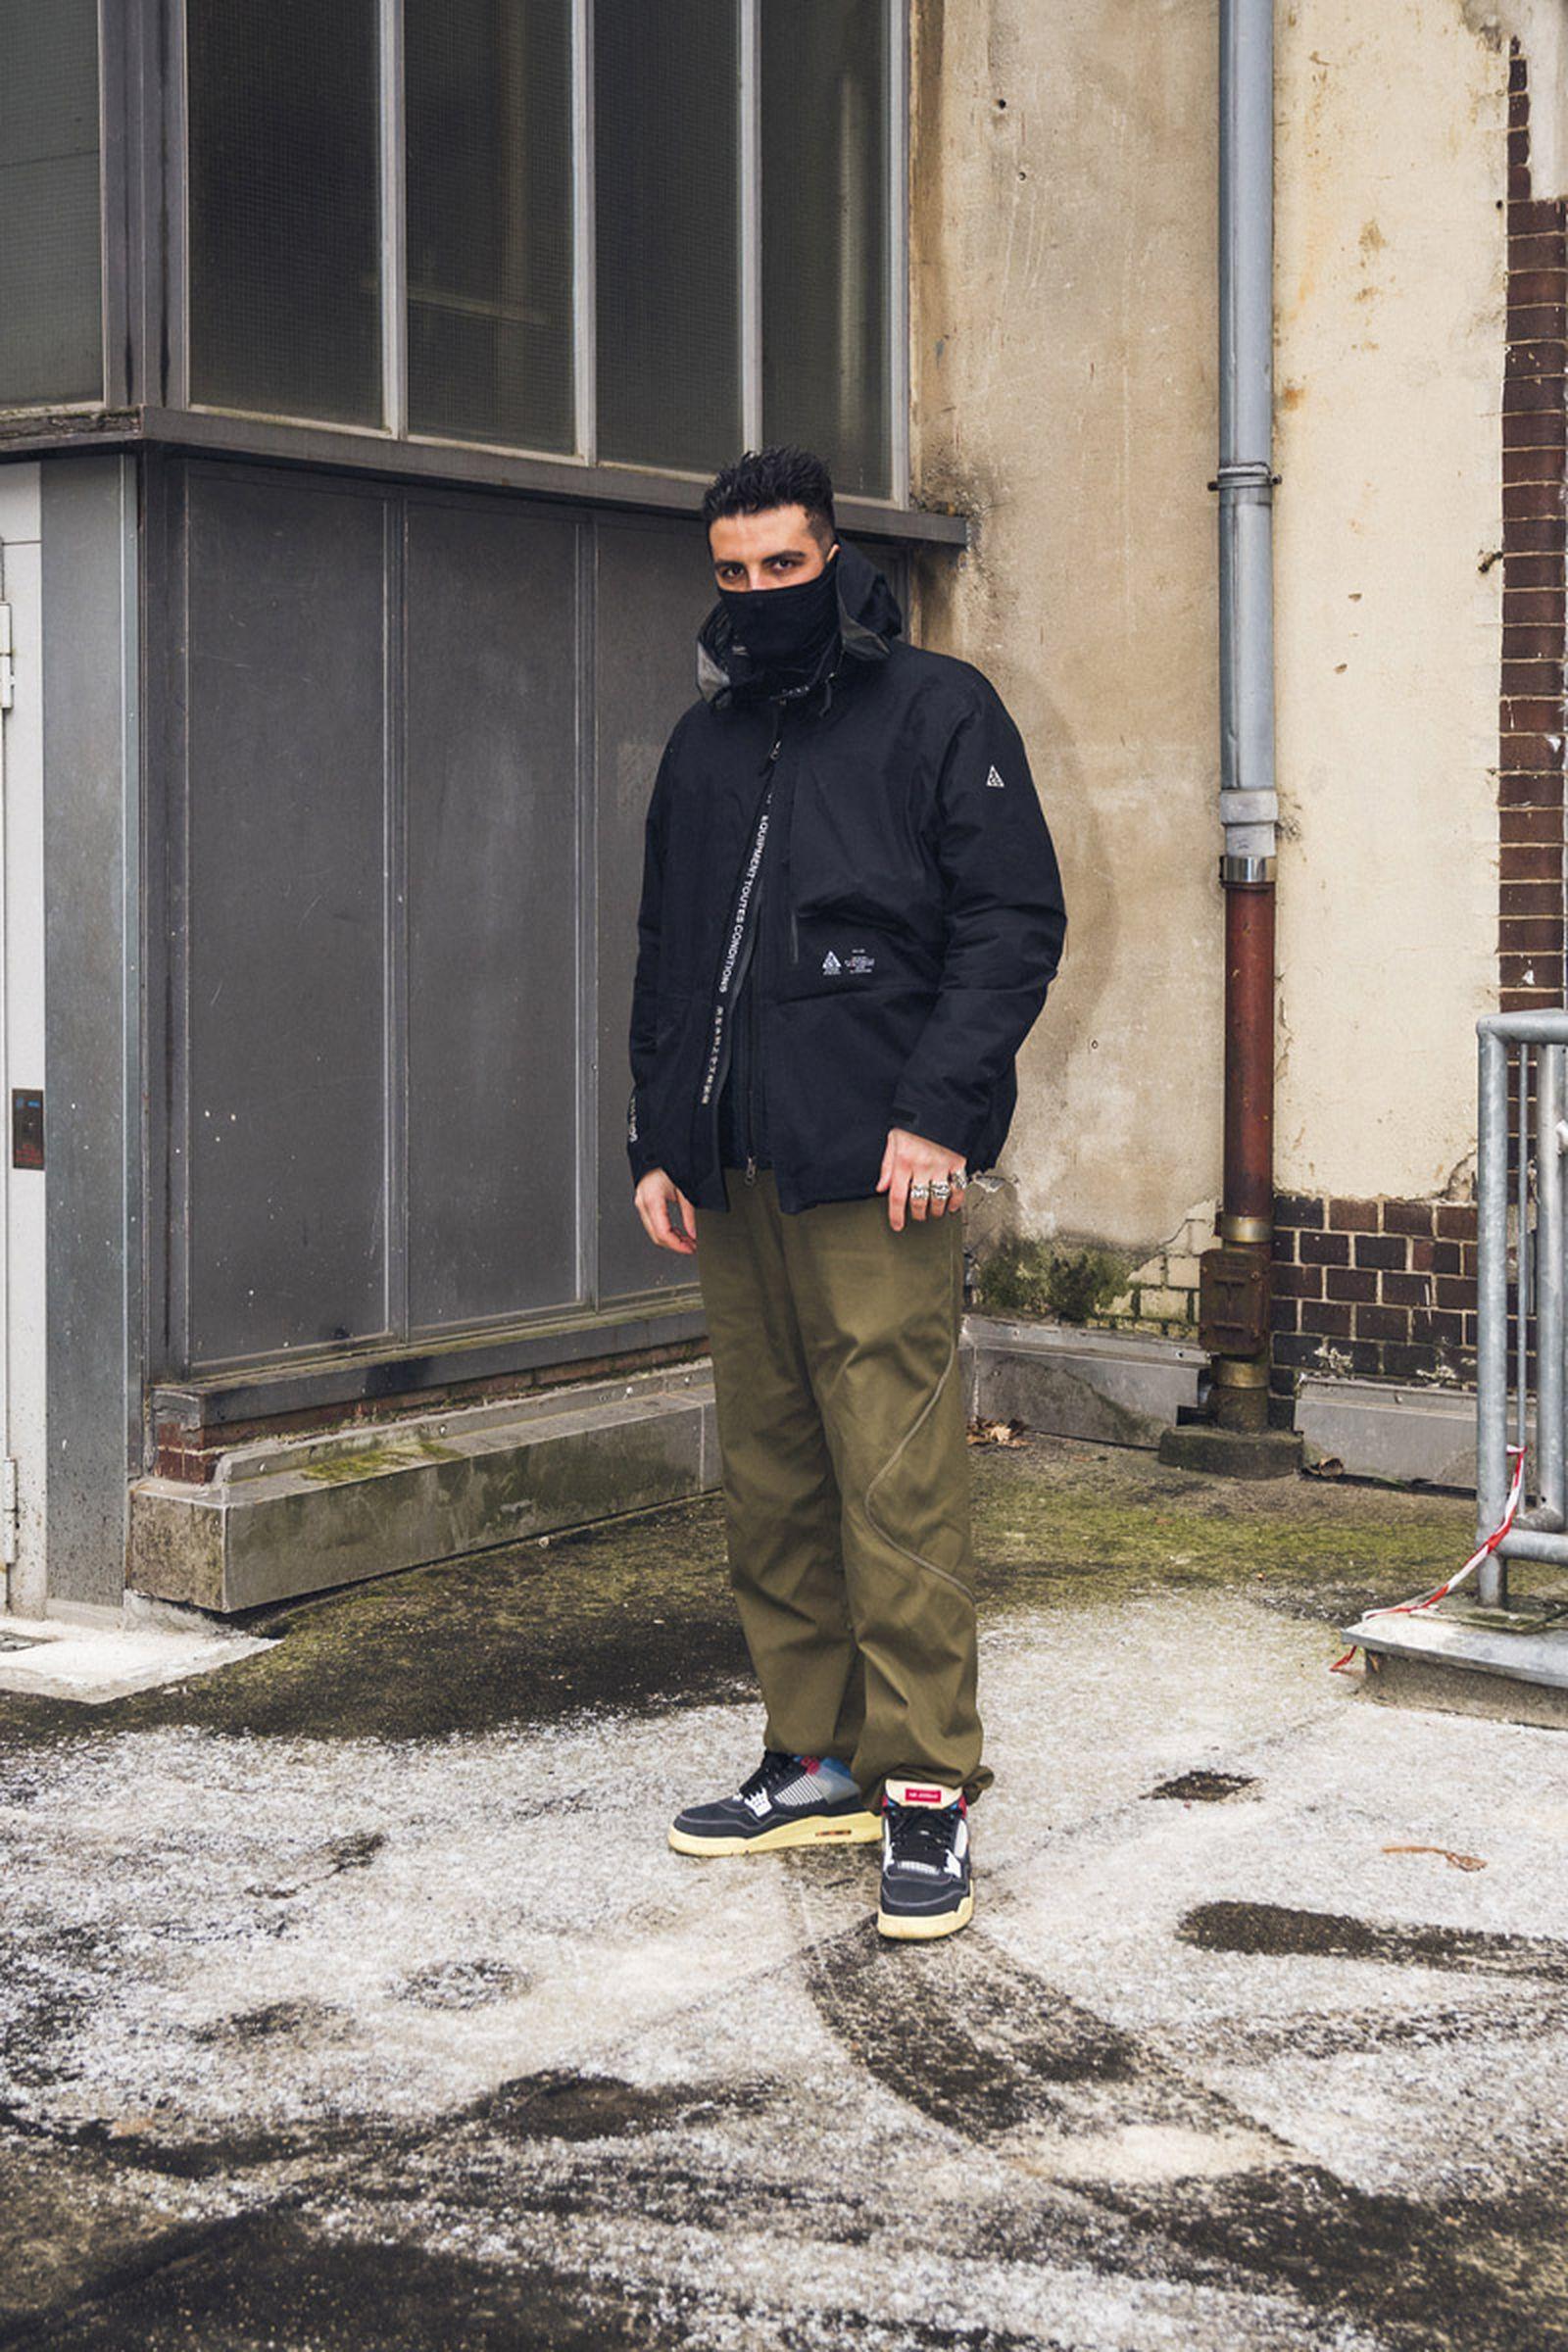 beinghunted-robert-smithson-not-in-paris-@kane-800x1200